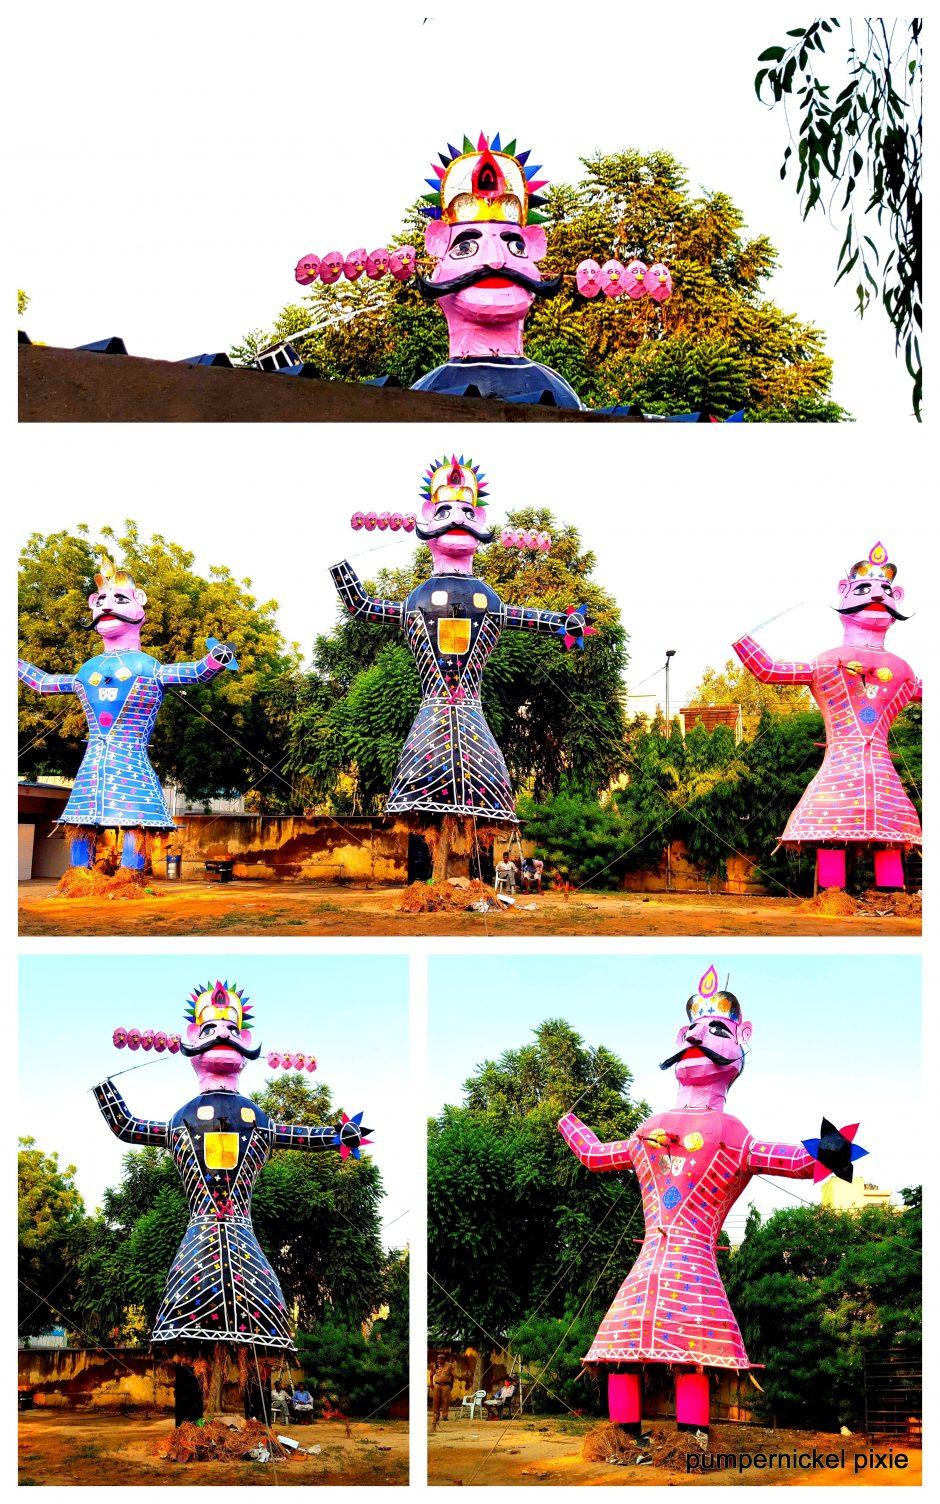 dussehra, vijaydashmi, india, festivals, culture, tradition, good over evil, ramayan, durga, goddess, mythical, mythology, navratri, nine divine nights, diwali, 2015, optimisim, positive, pumpernickel pixie